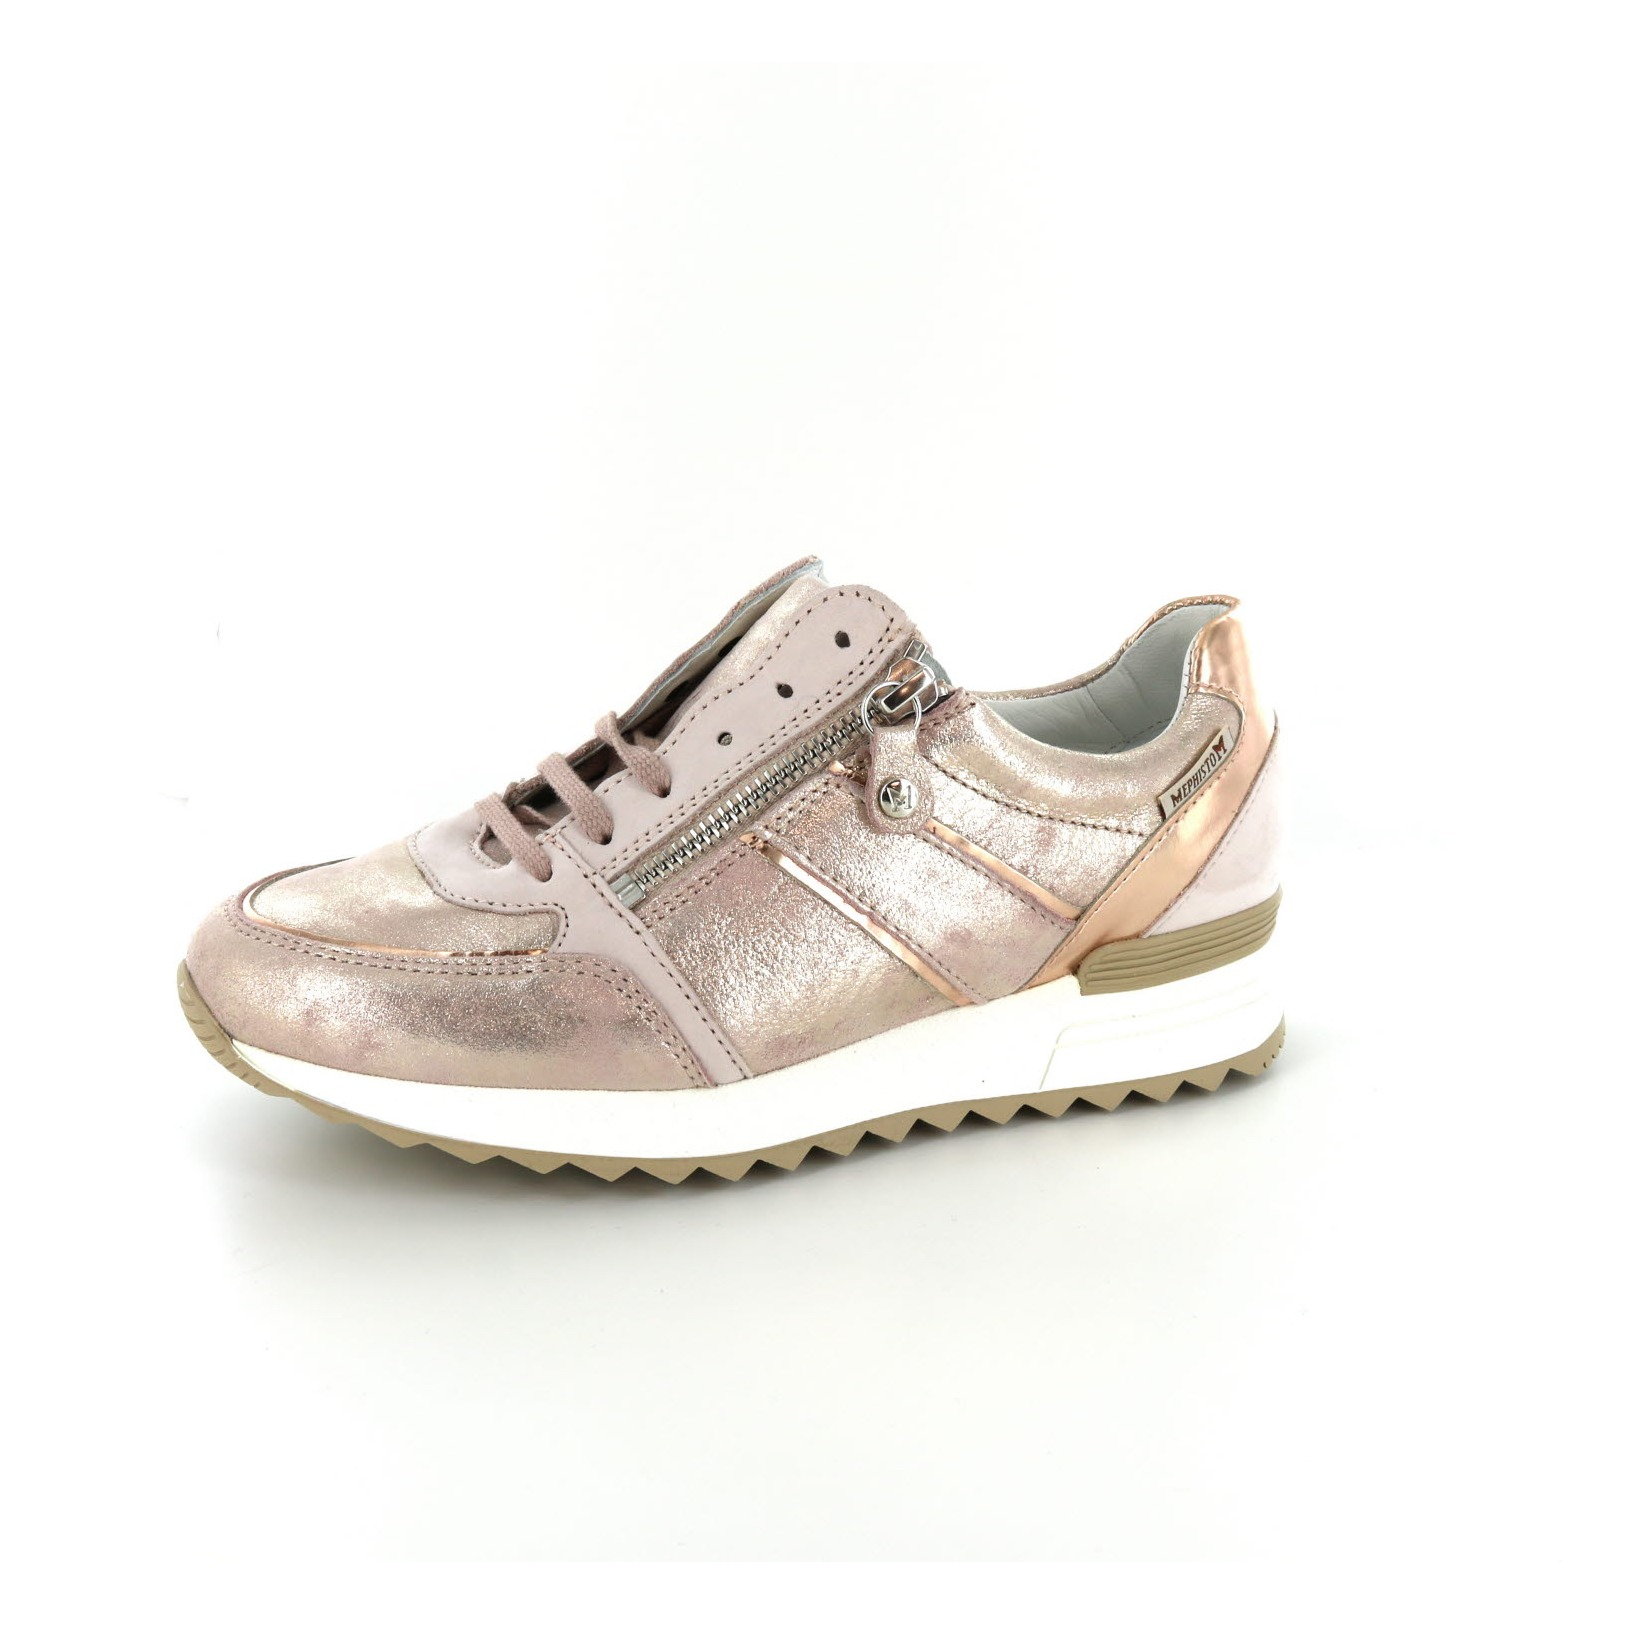 Chaussures Mephisto / Dentelle - Chaussures De Sport, Rose